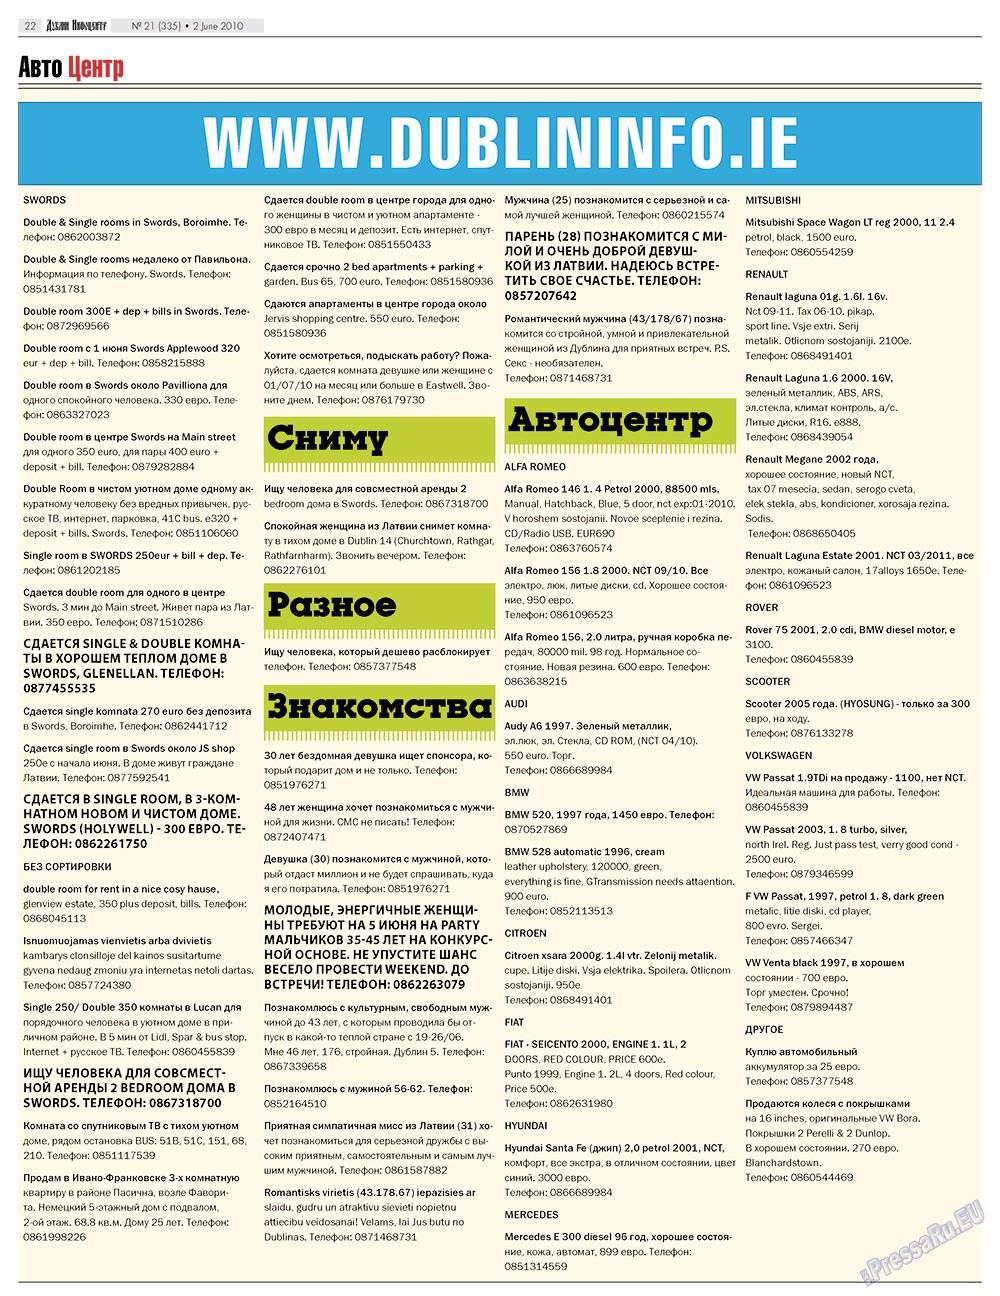 Дублин инфоцентр (газета). 2010 год, номер 21, стр. 22